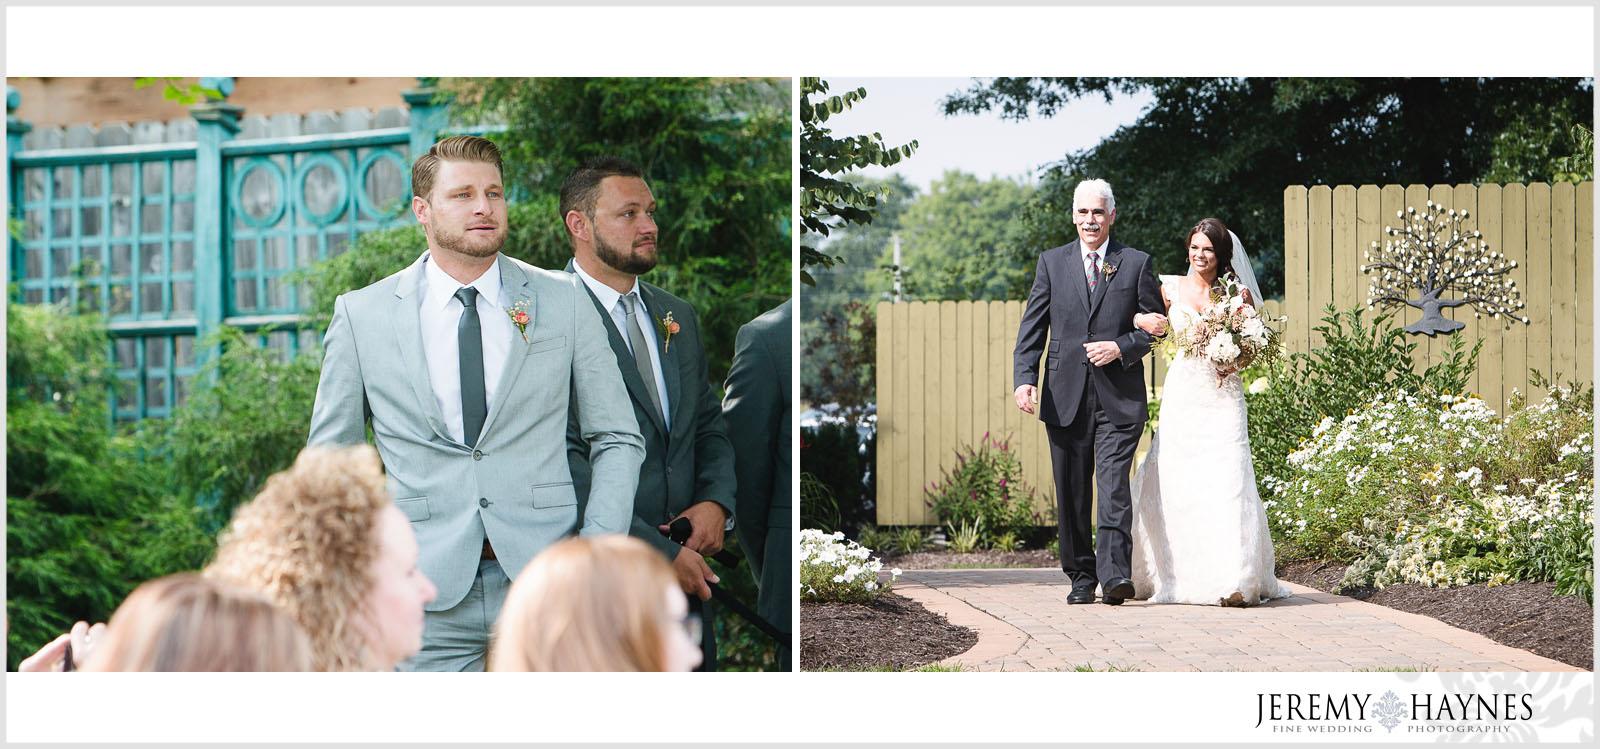 wedding-ceremony-avon-gardens